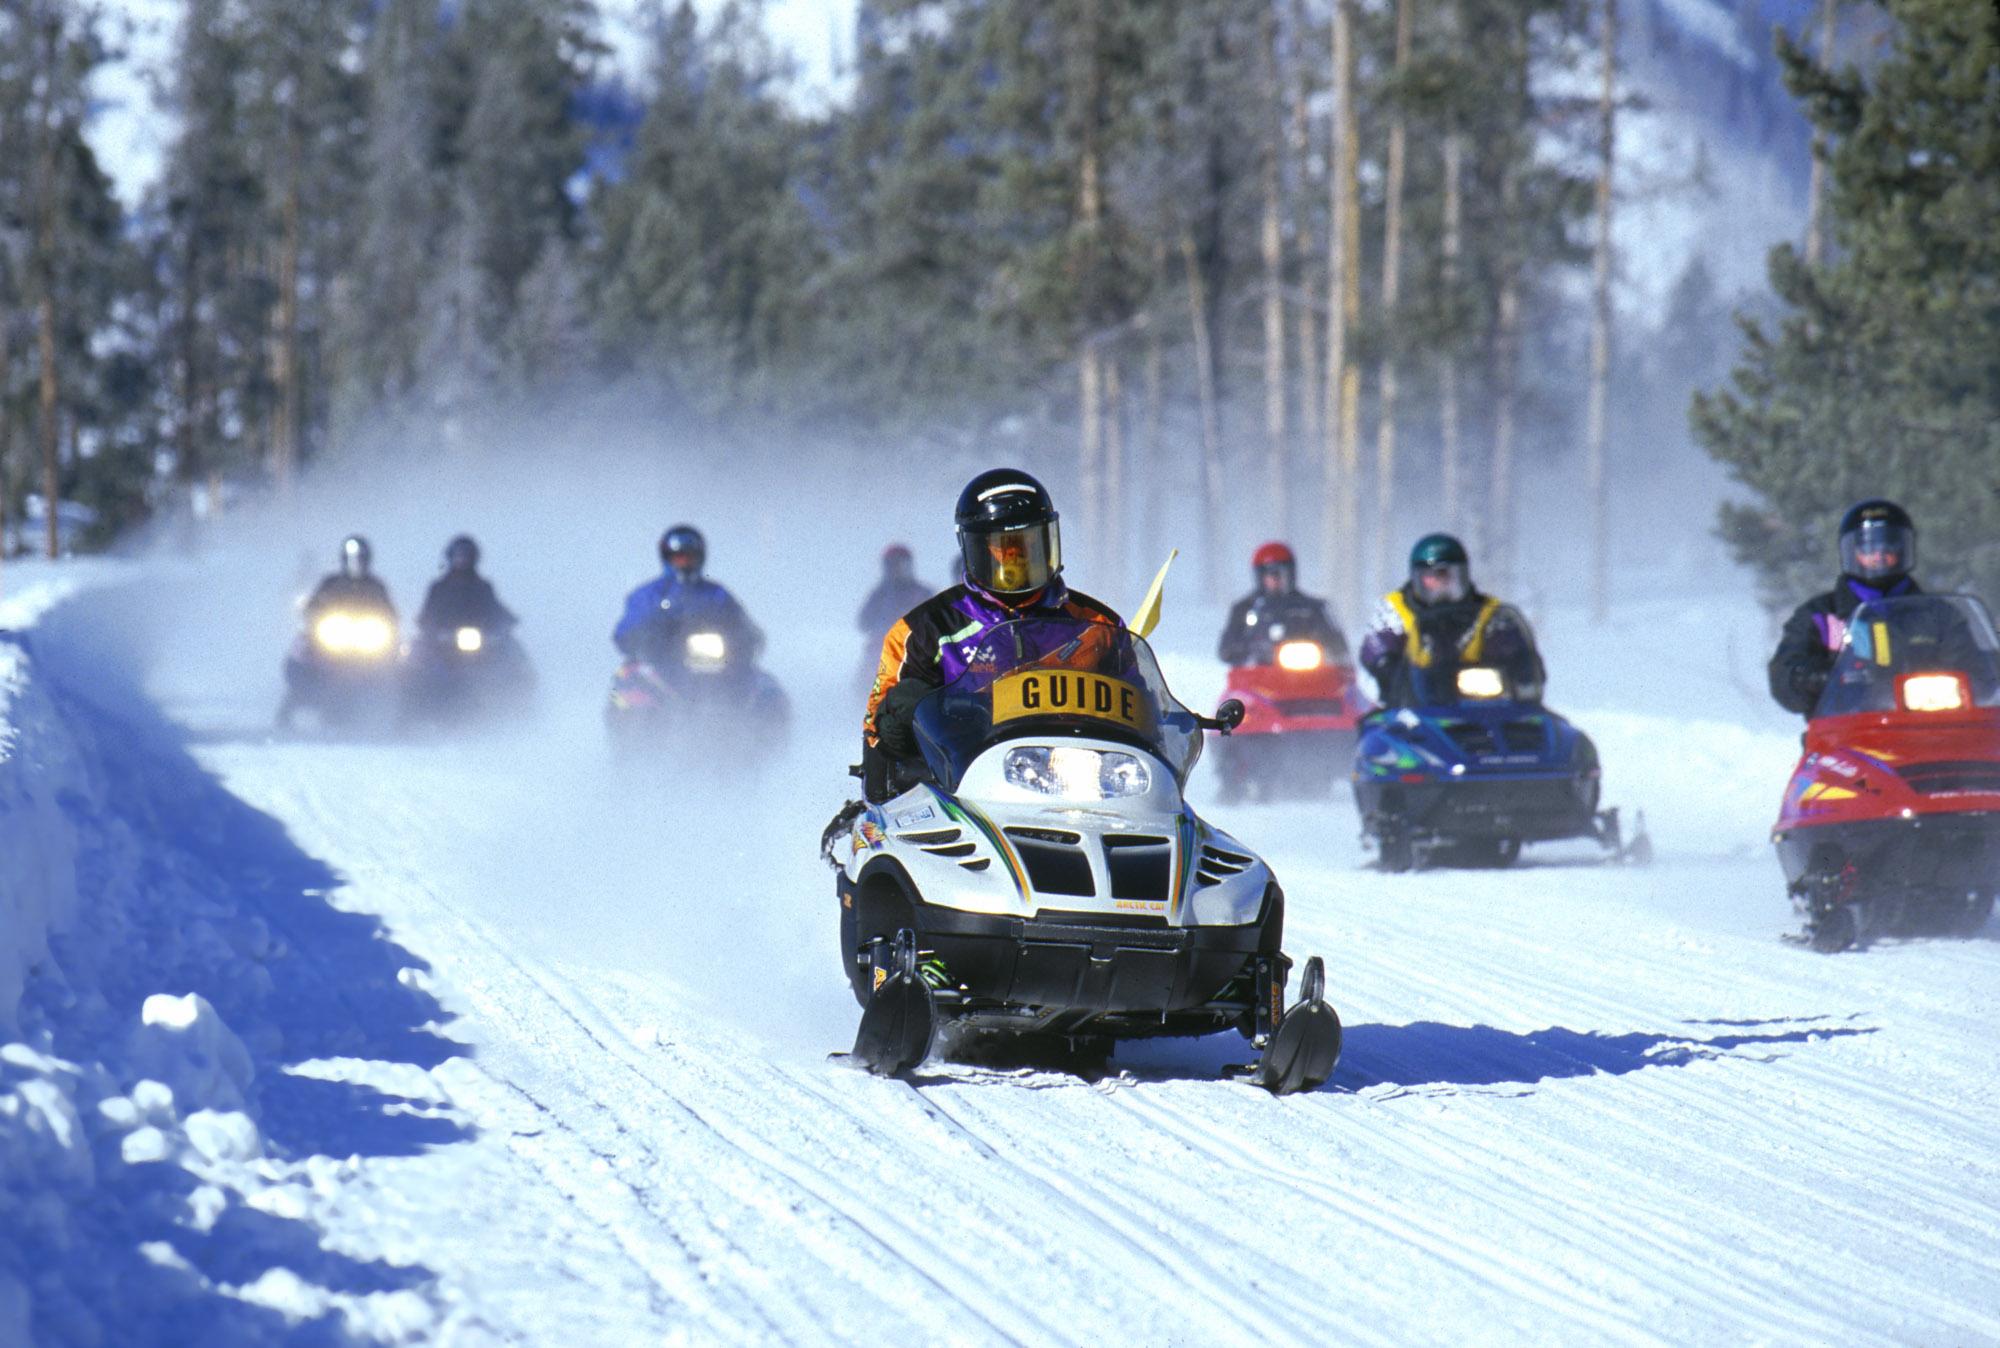 snowmobiling_adventure-sports-adventure tourism